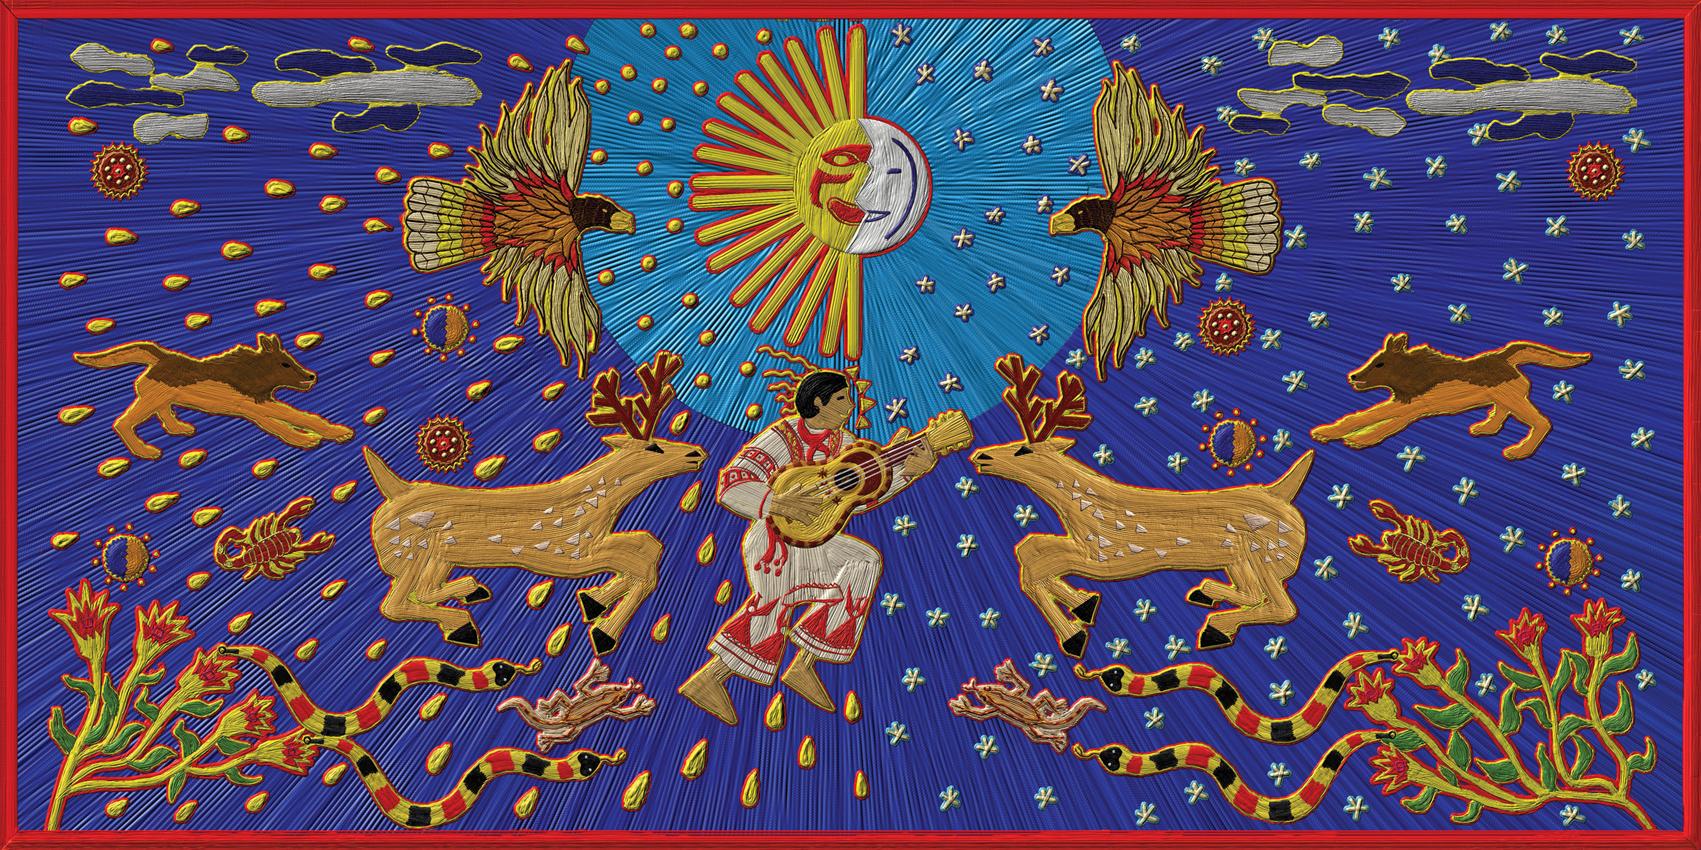 Best 39 Huichol Wallpaper on HipWallpaper Huichol Wallpaper 1701x850